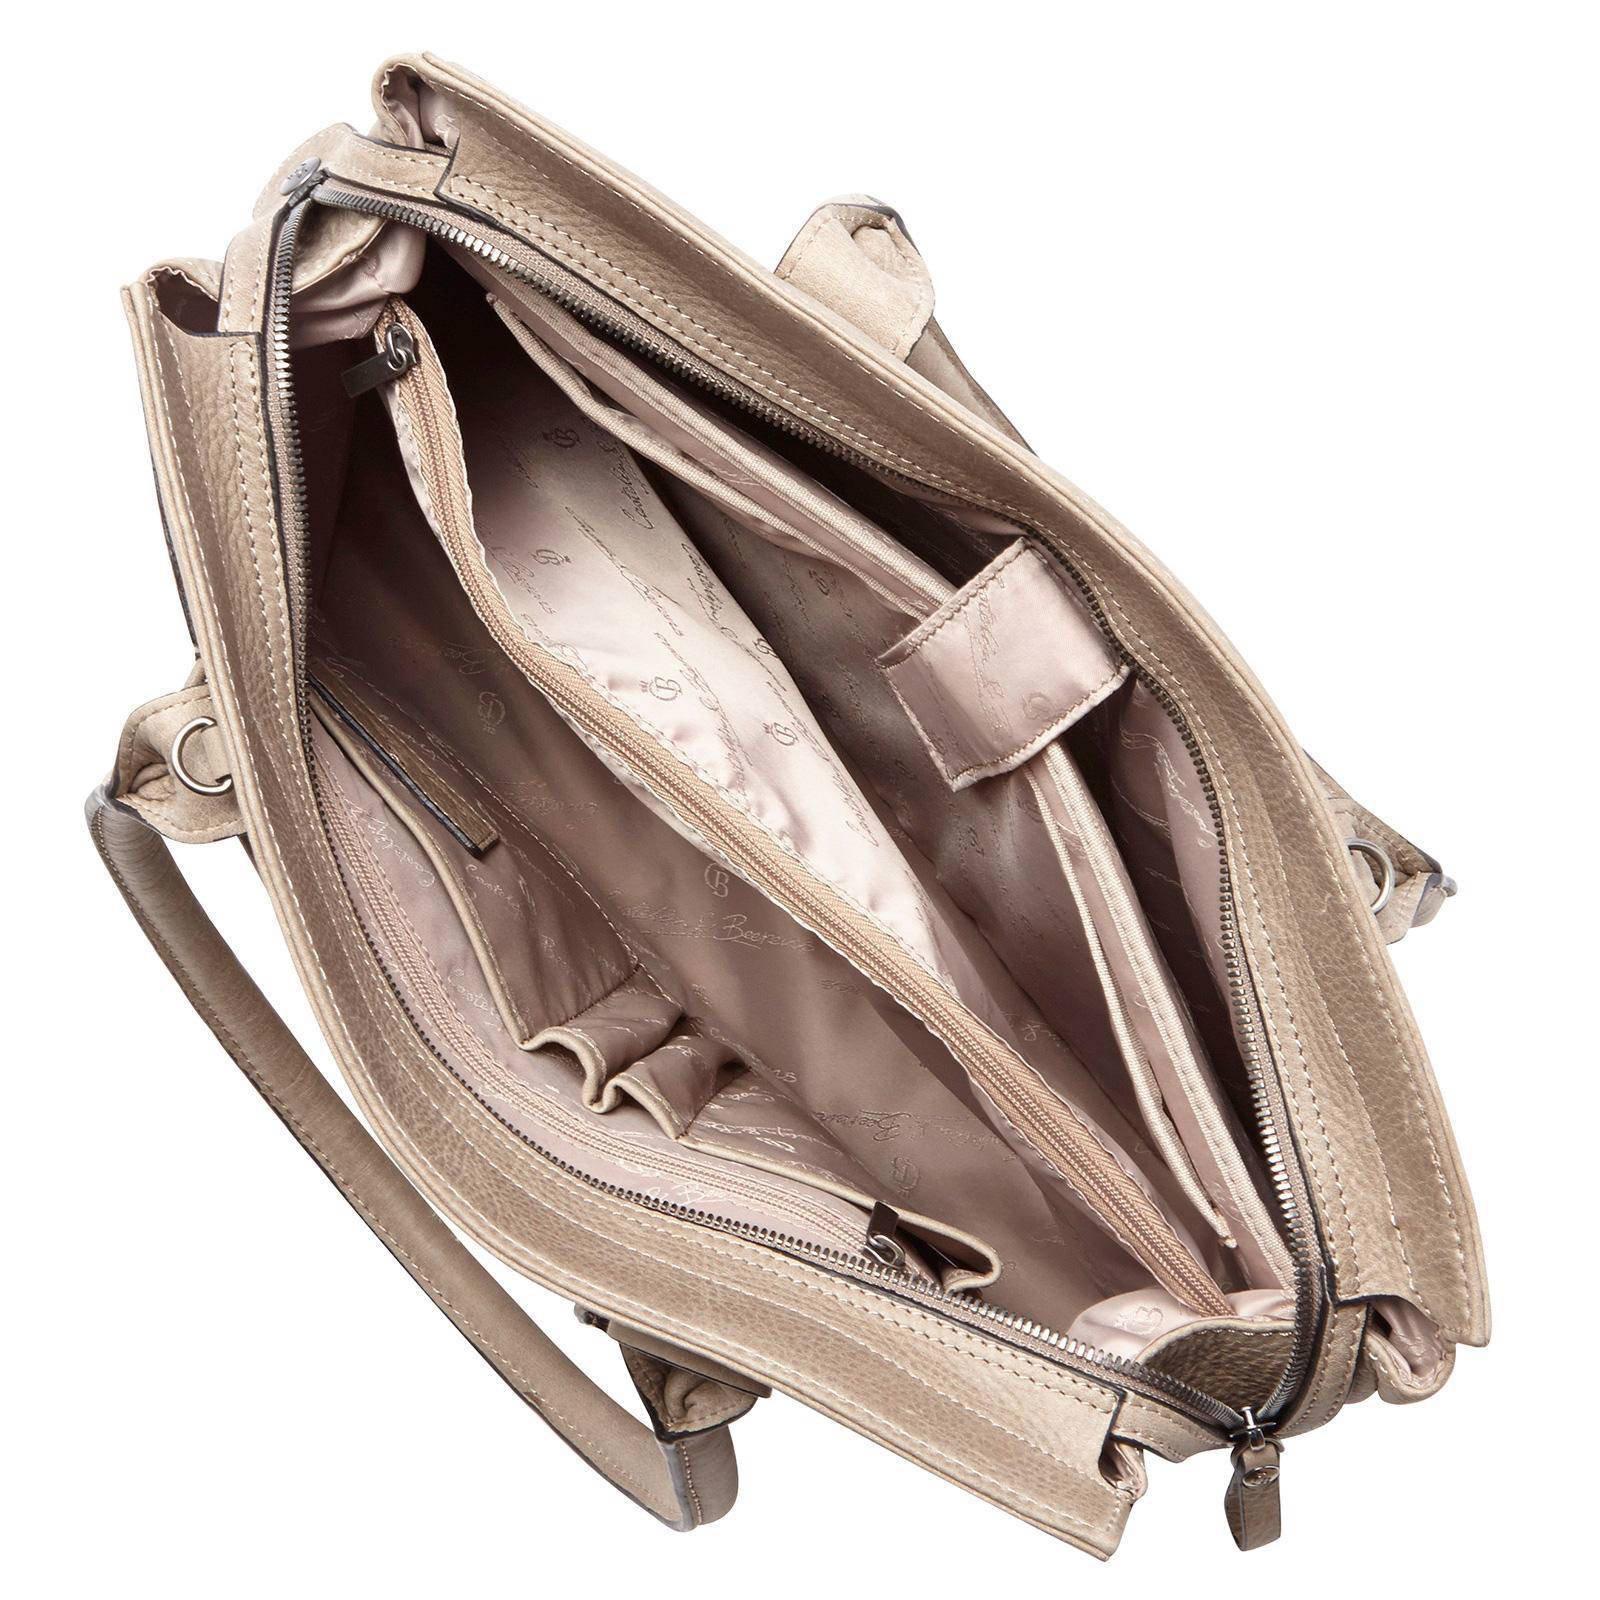 63f3ad1a0e2 Castelijn & Beerens 15,6 inch Carisma Business Bags leren laptoptas |  wehkamp